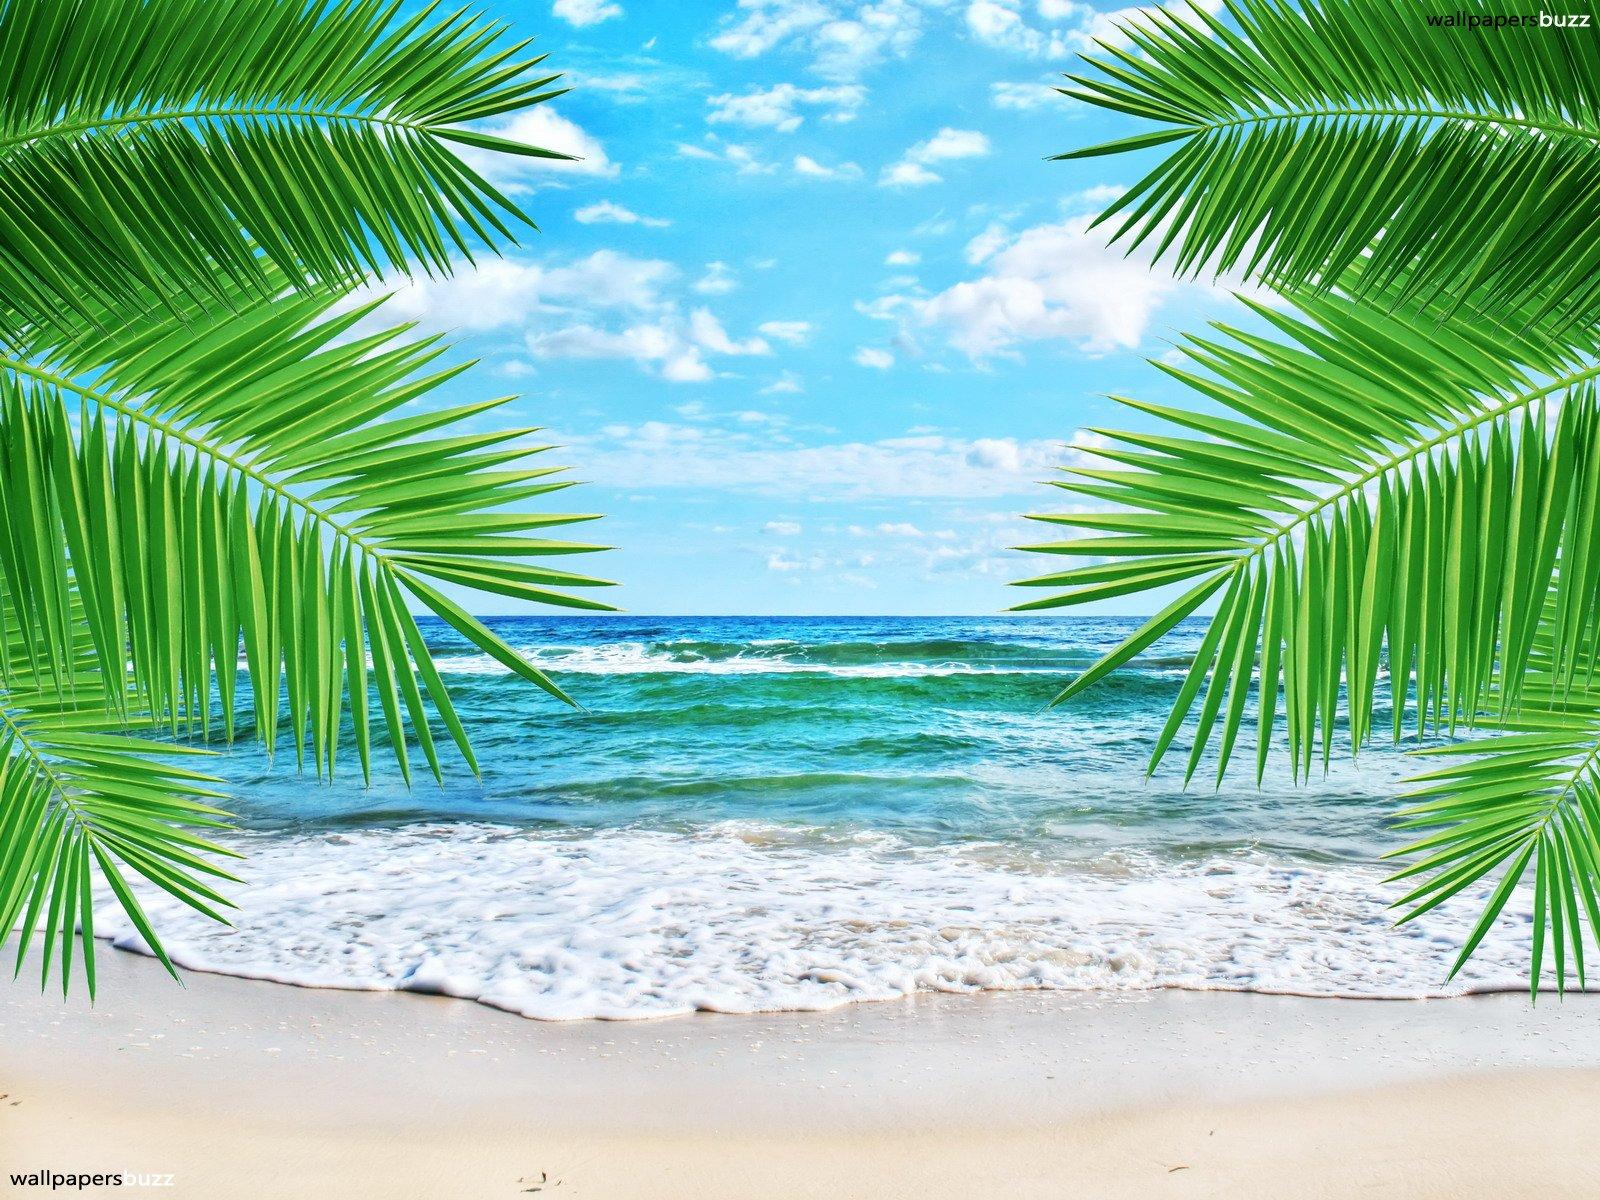 beach download wallpapers Desktop Backgrounds for 1600x1200